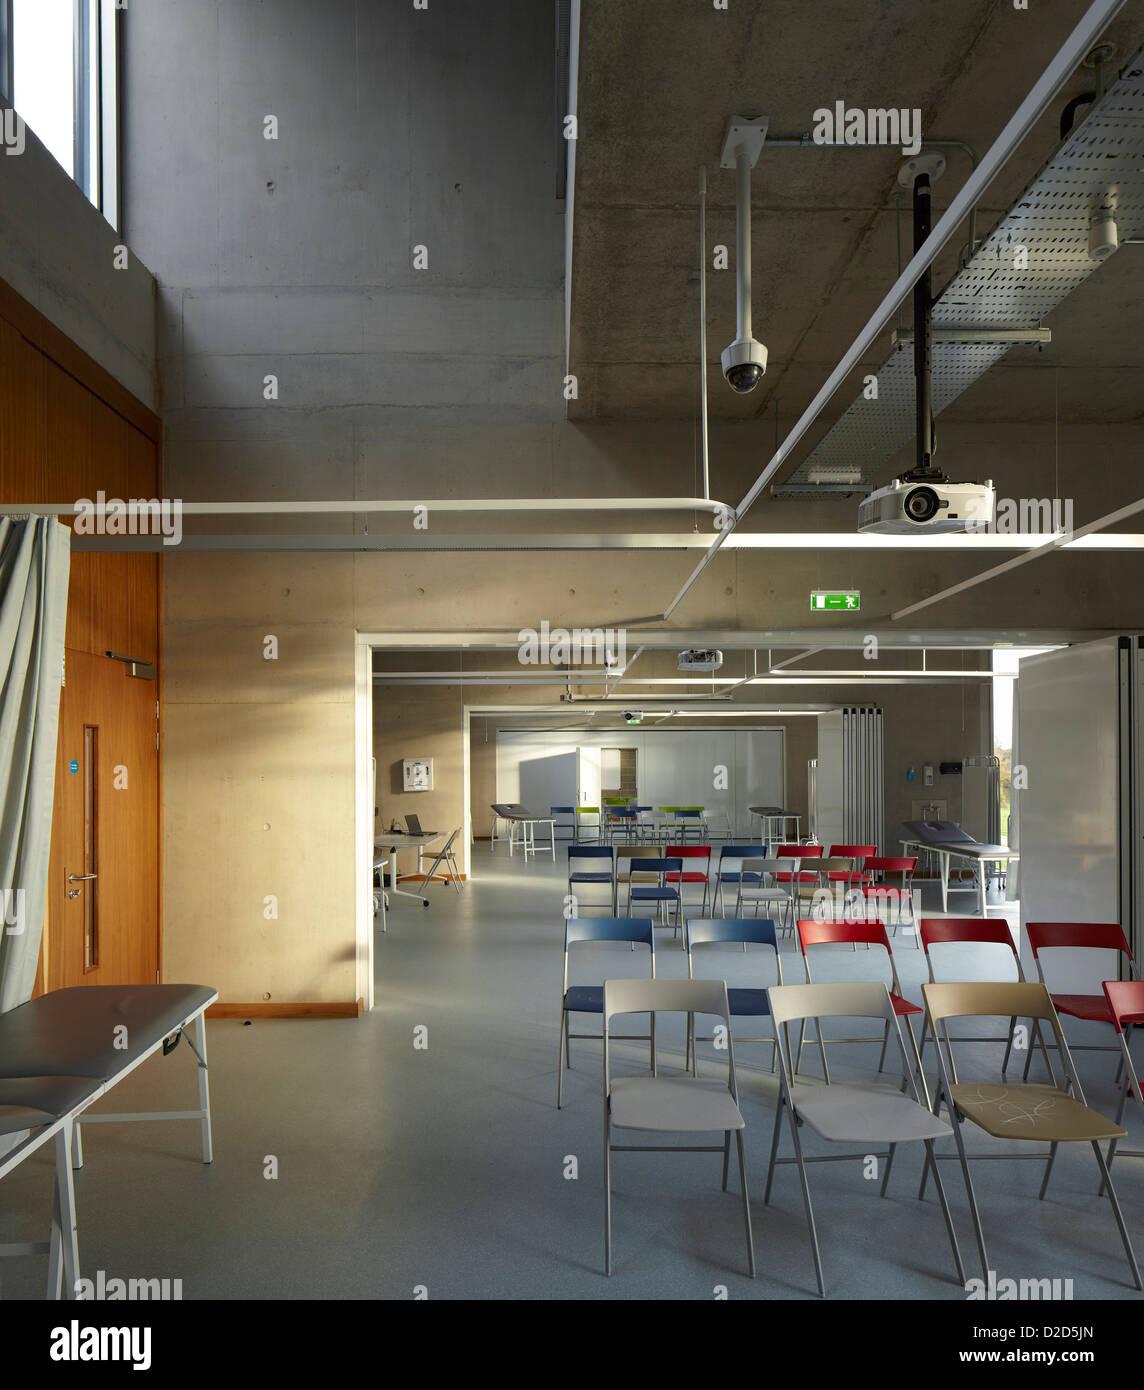 Medical School Building And Student Accommodation University Limerick Ireland Architect Grafton Architects 2012 V